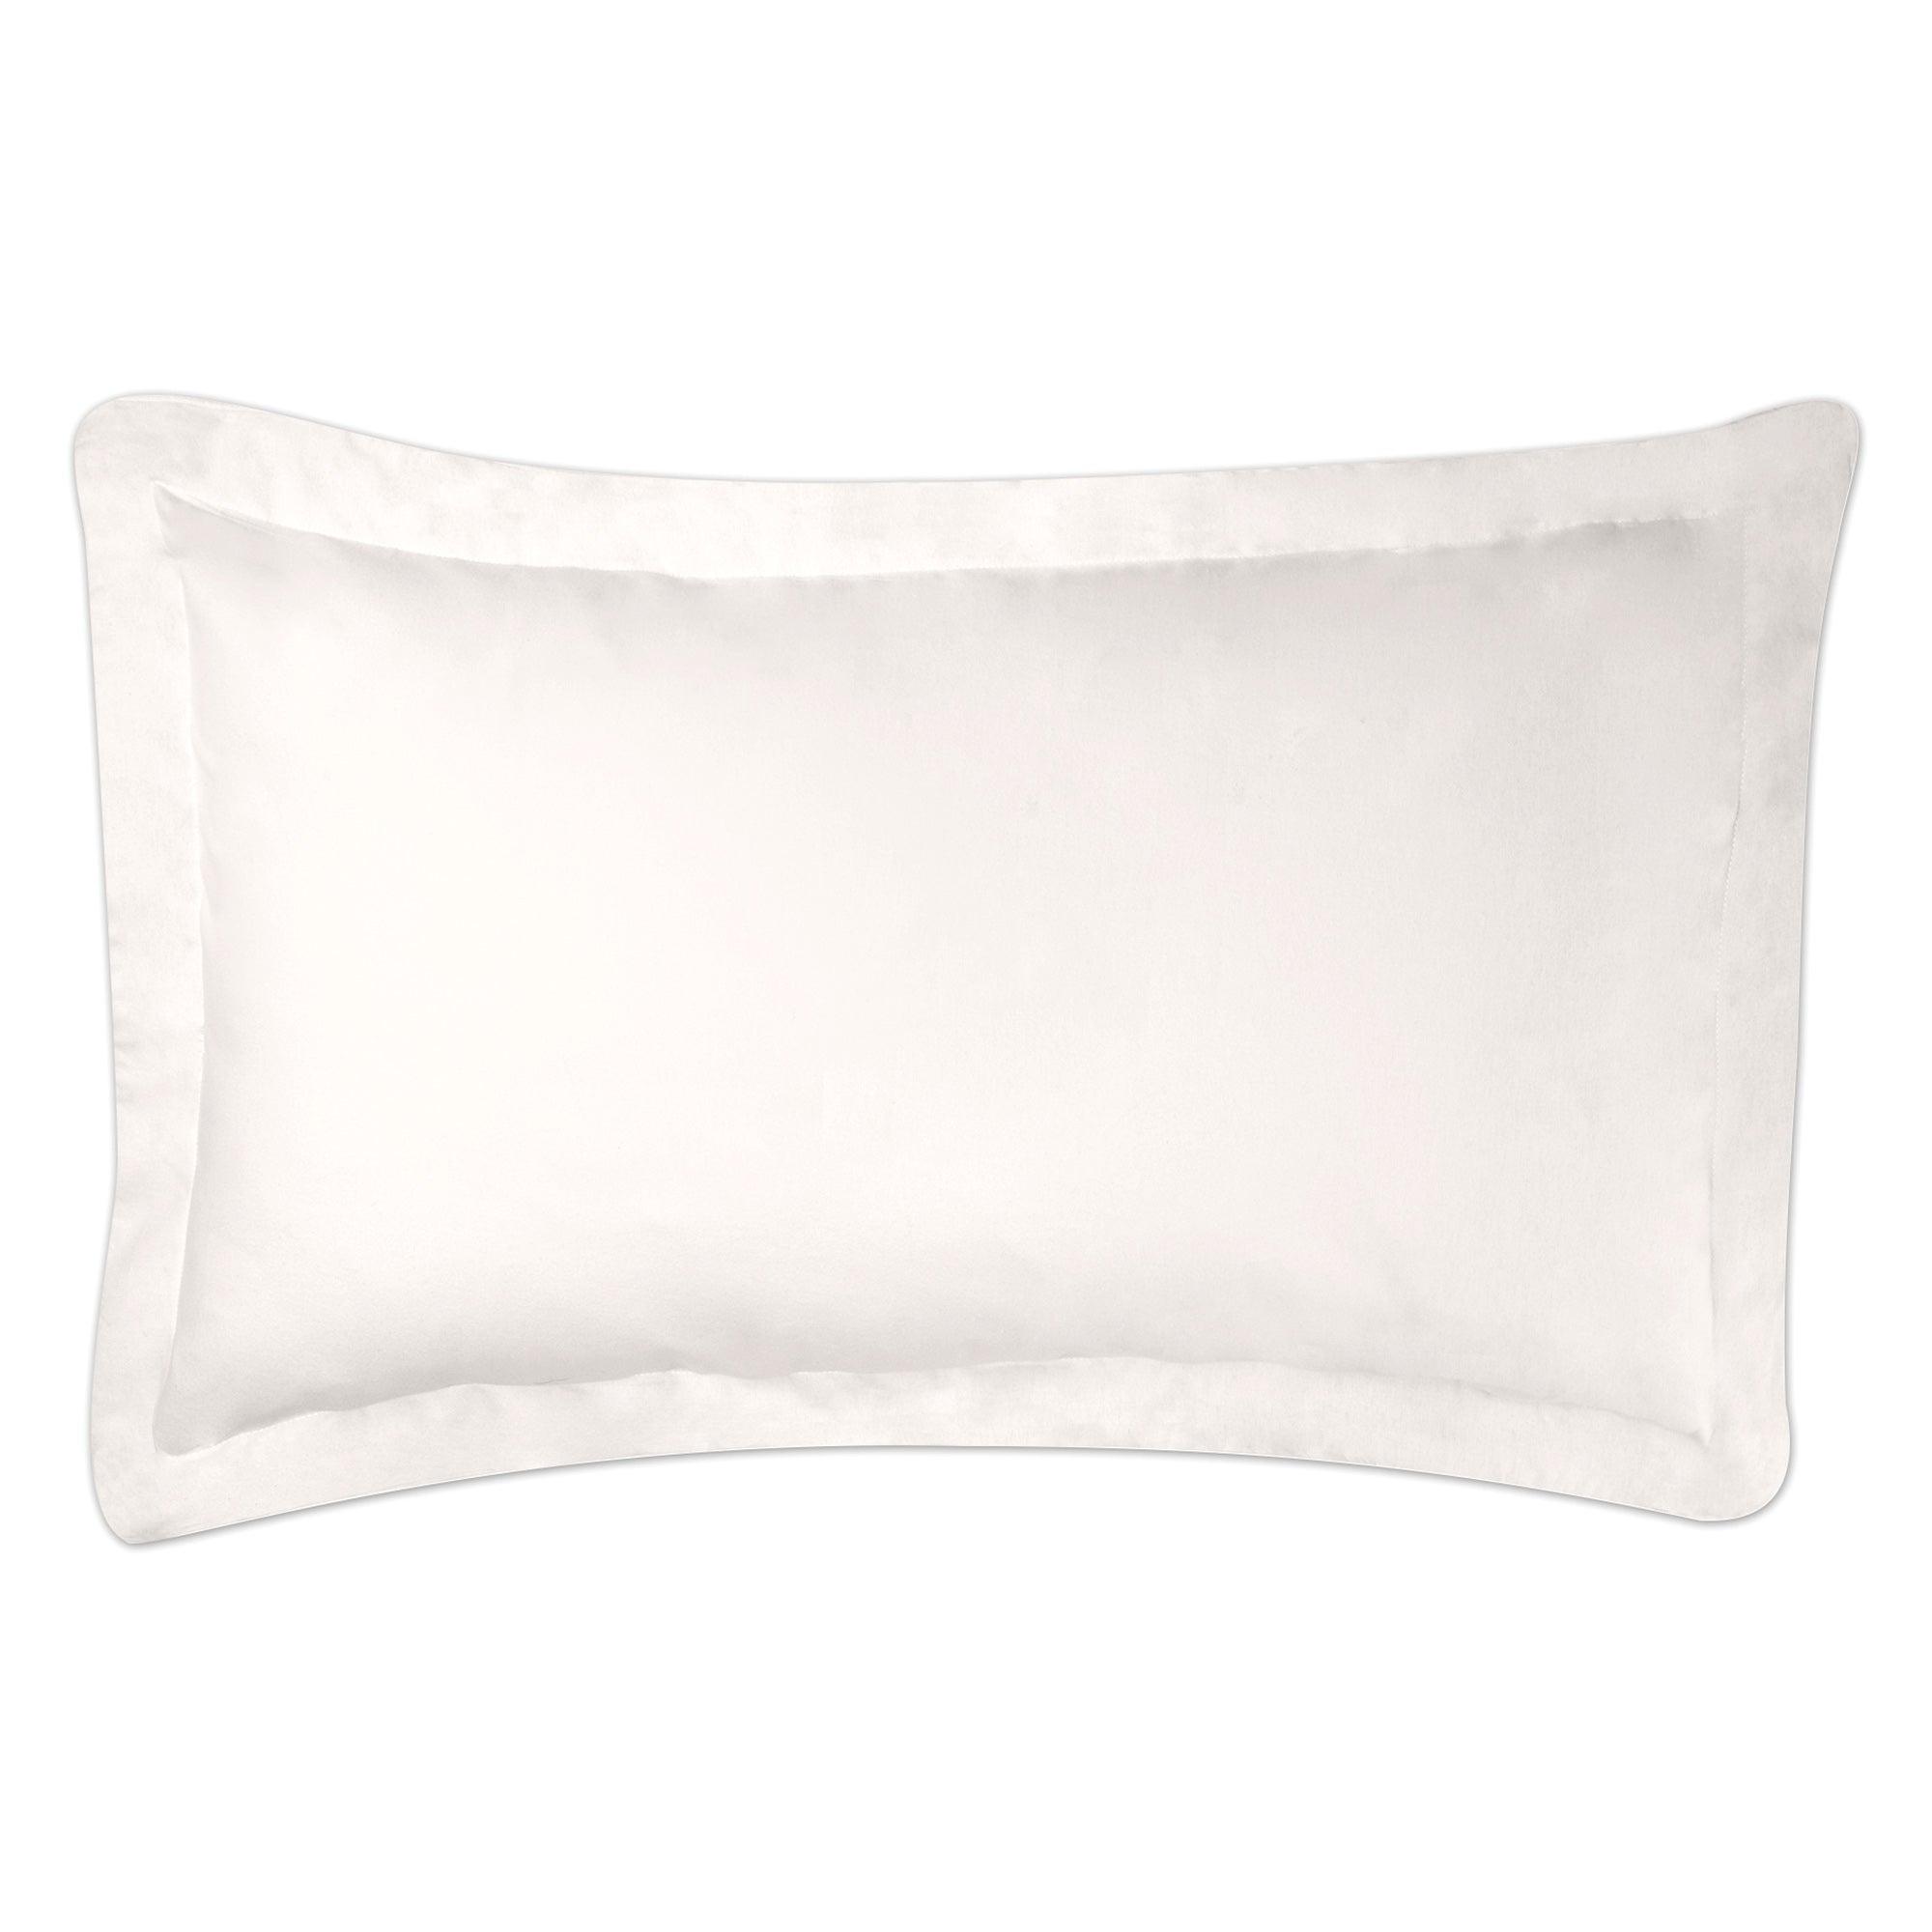 Dorma Cream Velvety Soft Oxford Pillowcase